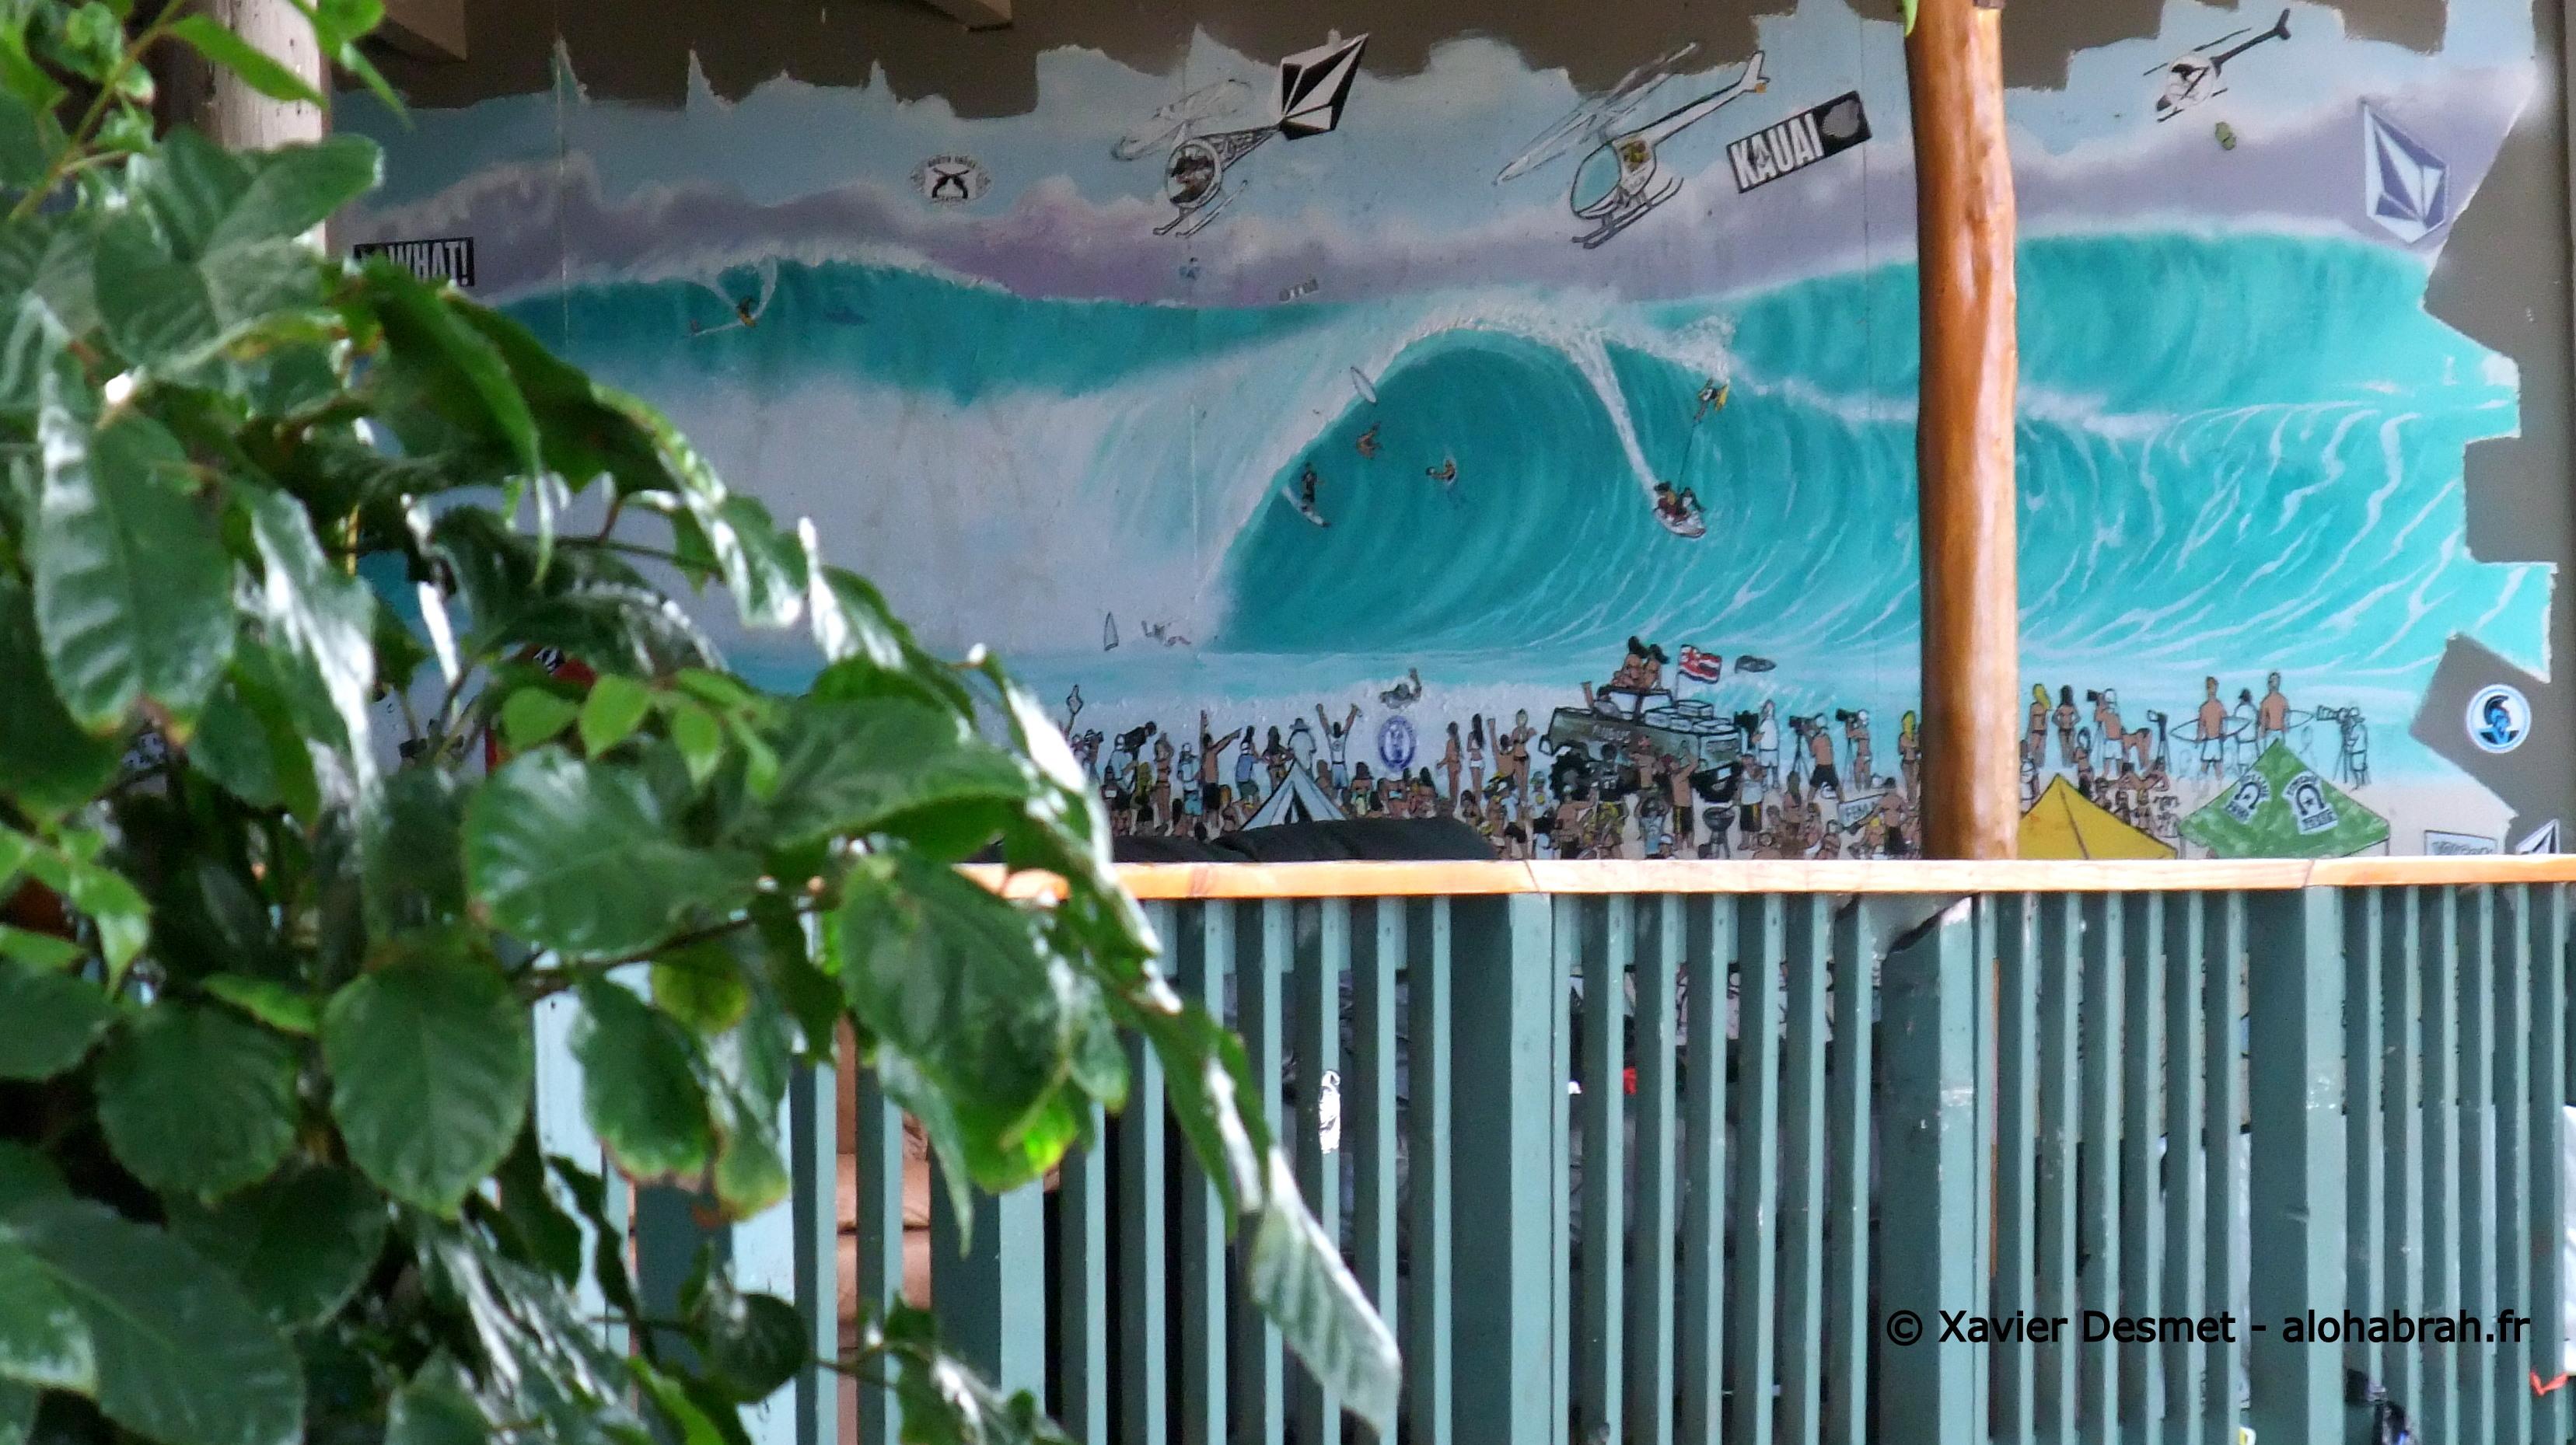 La fresque du mur de la seconde Pipe House de Volcom © Xavier Desmet - alohabrah.fr